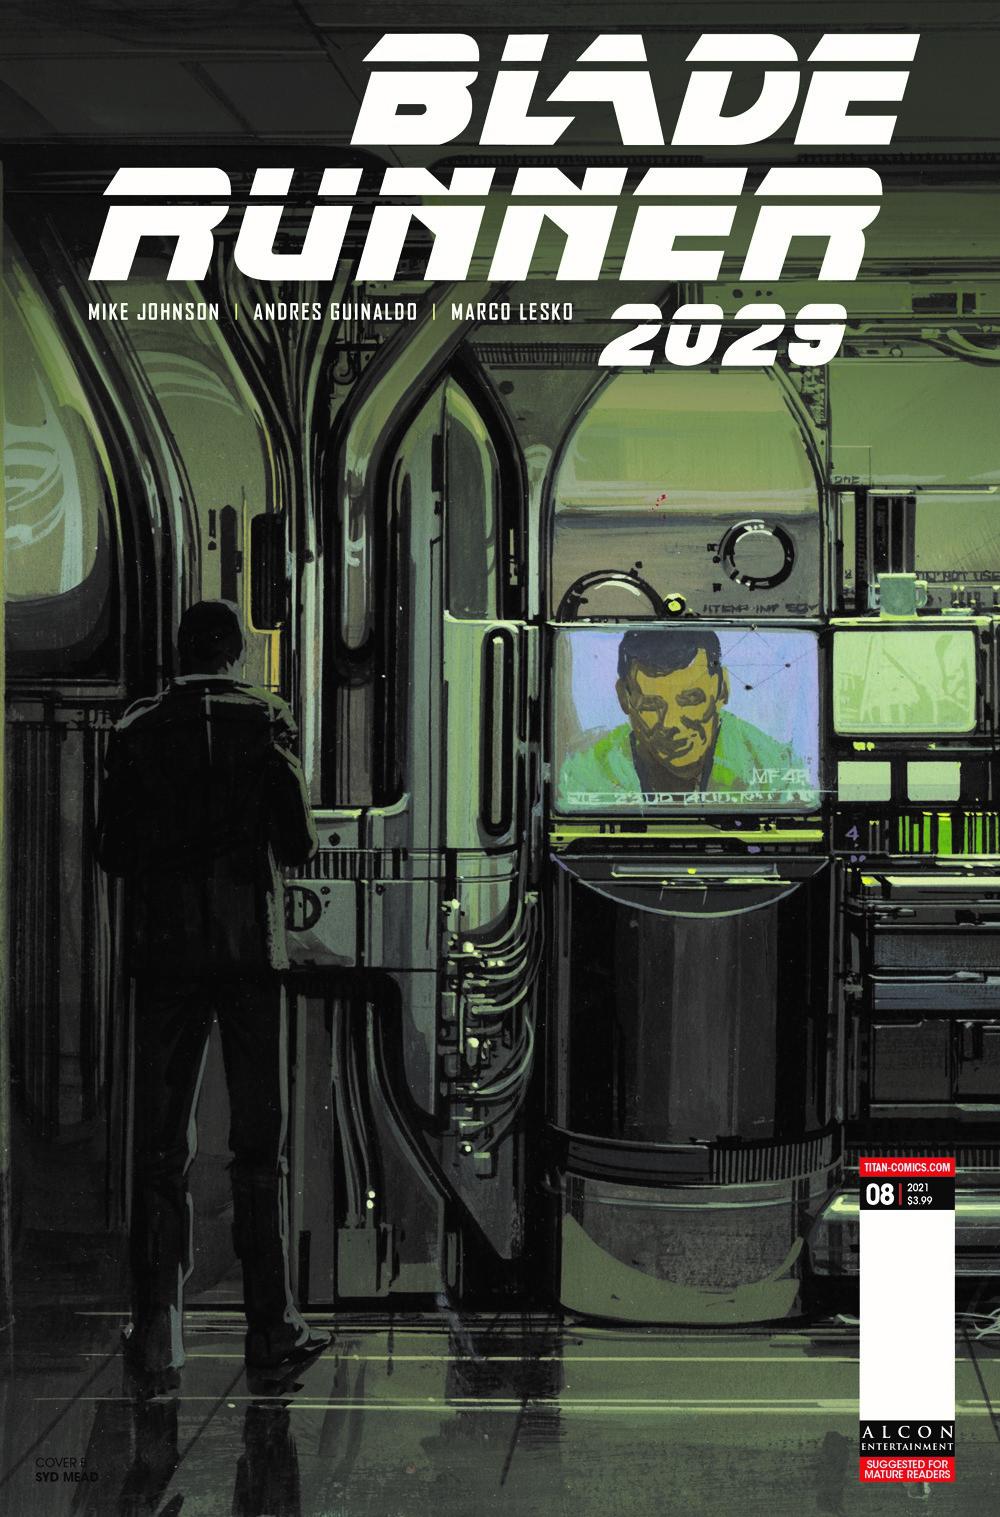 BLADE-RUNNER-2029-8-CVR-B-MEAD-MR ComicList Previews: BLADE RUNNER 2029 #8